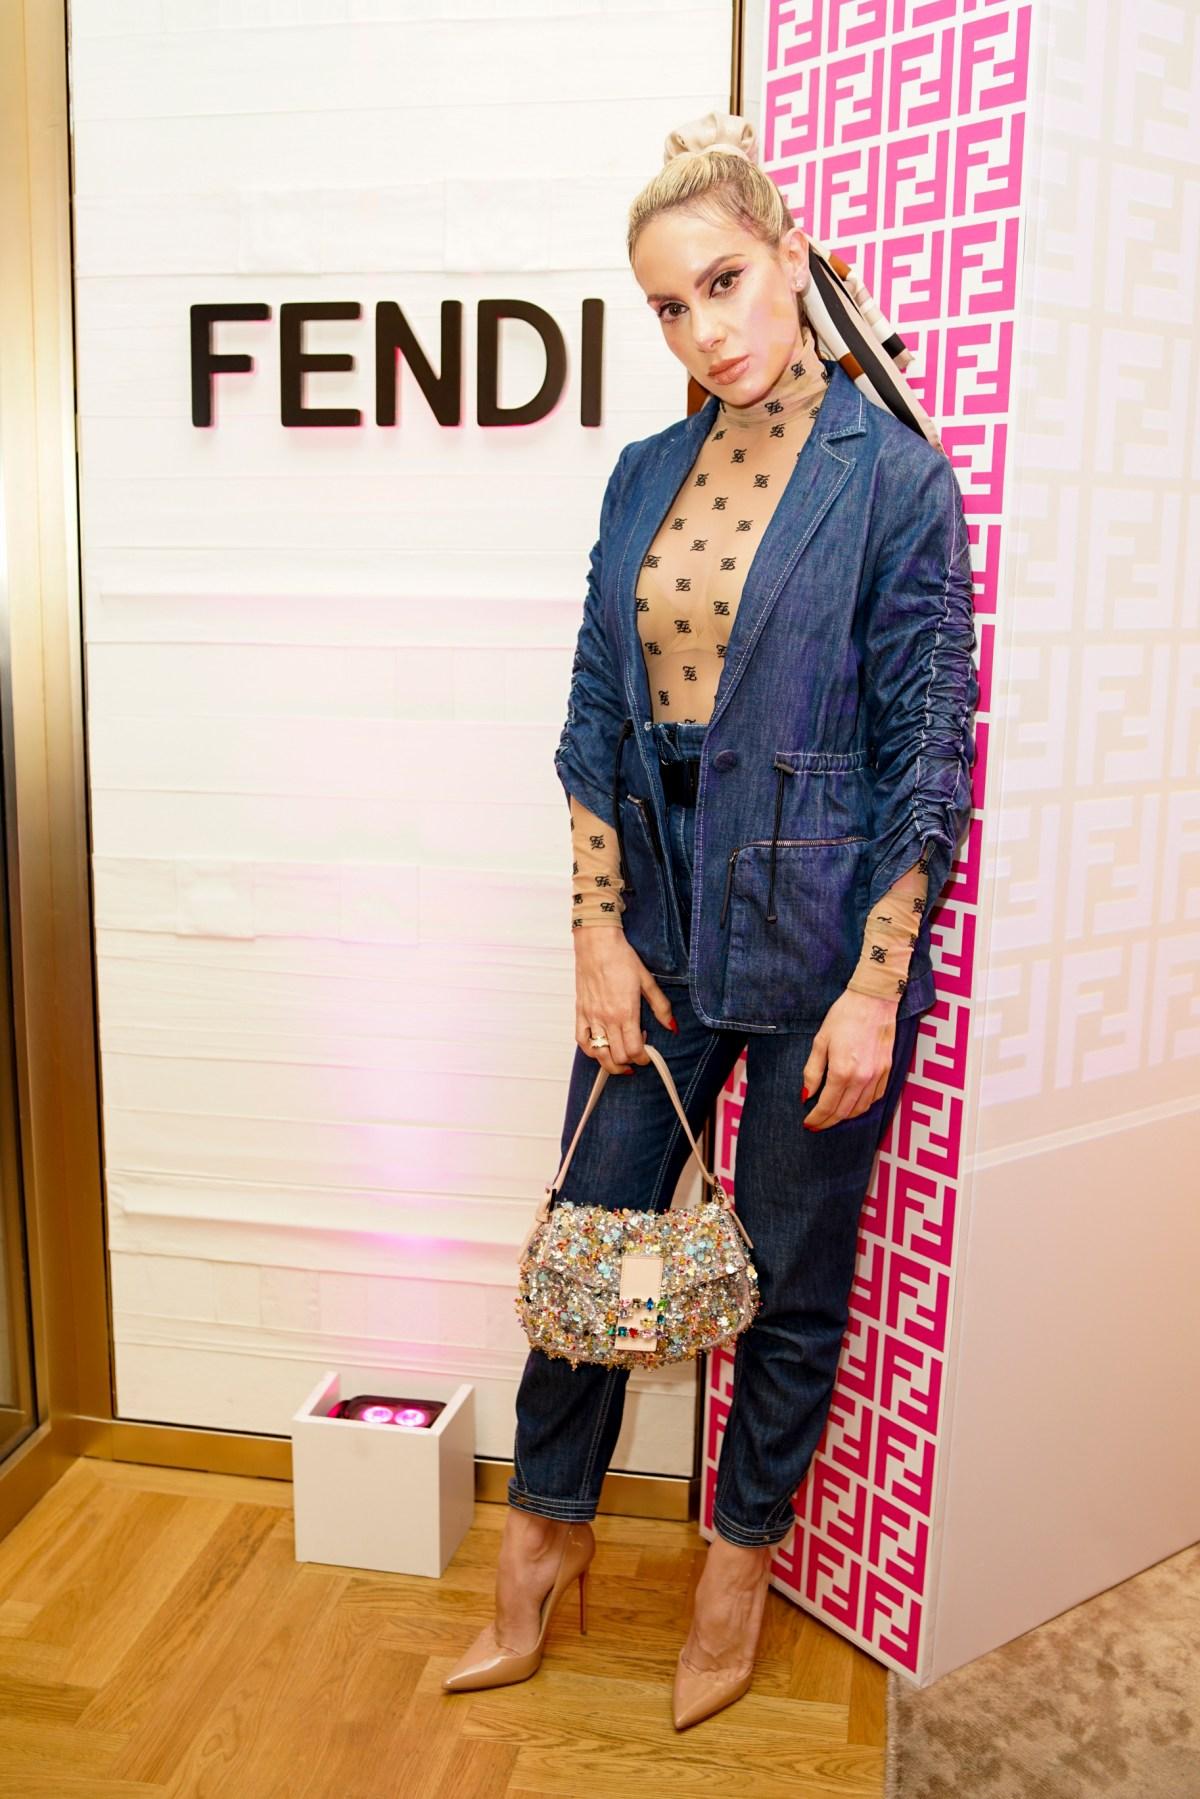 FENDI PRINTS ON EVENT Oct 22nd_SiraPevida_210